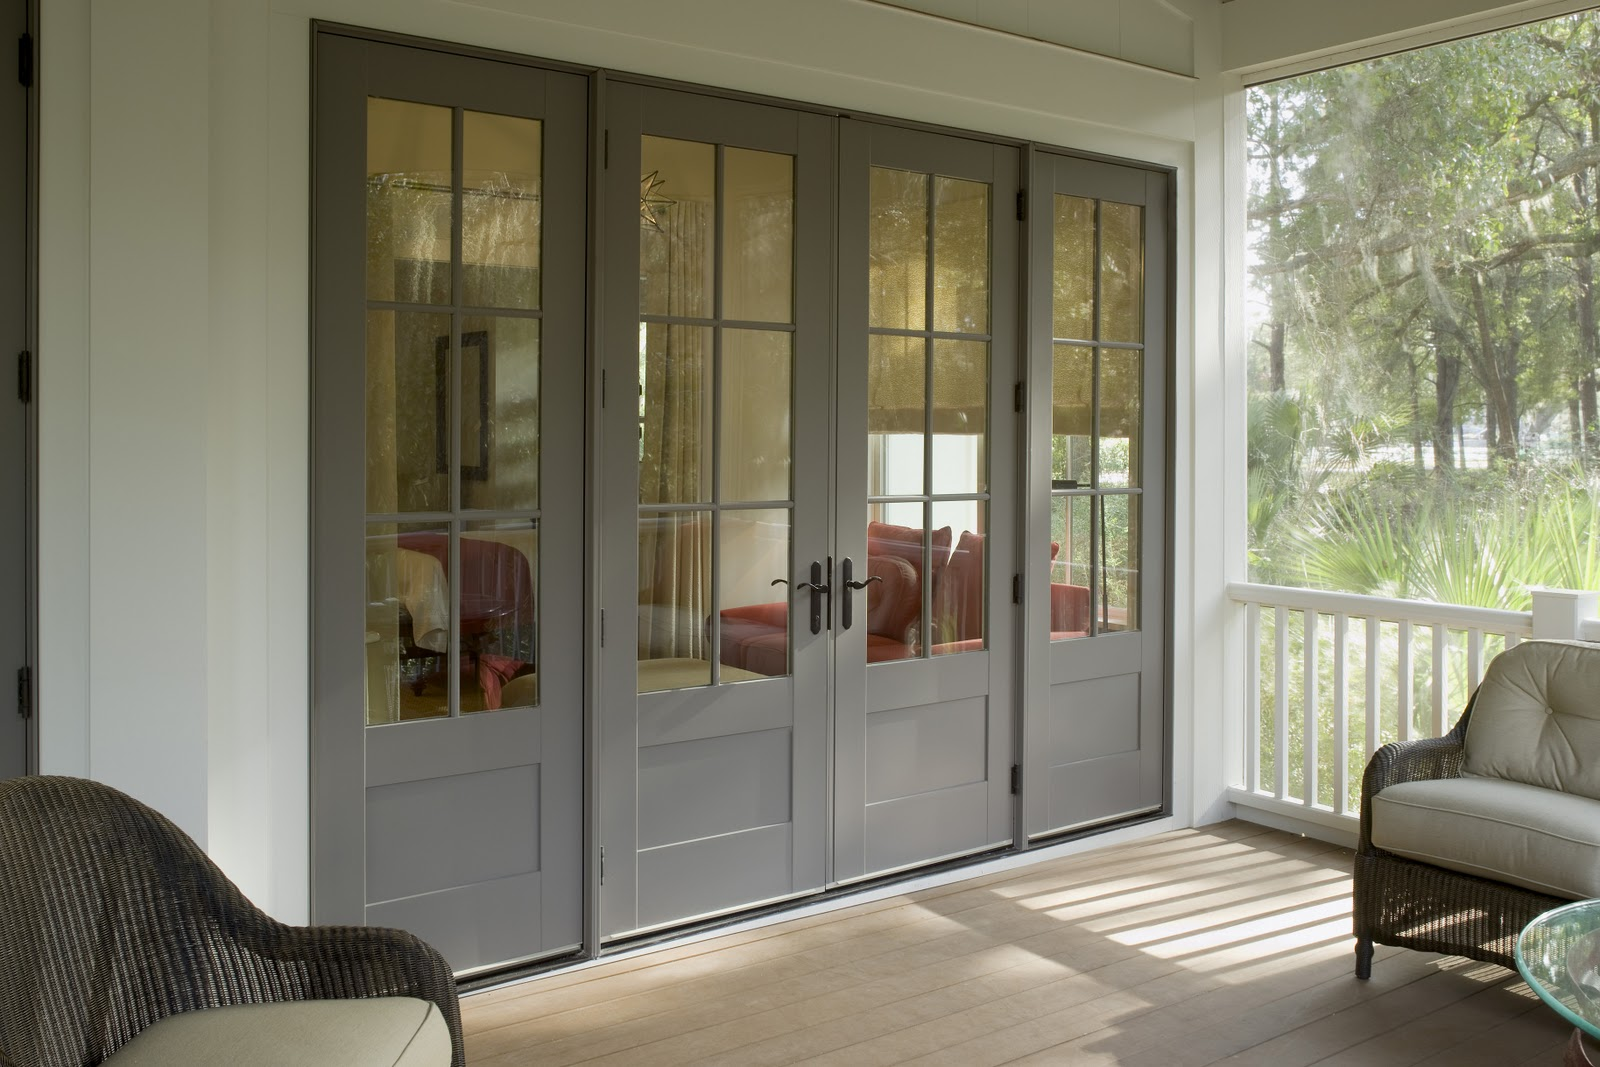 Statements define your home windsor windows and doors for Your home windows and doors